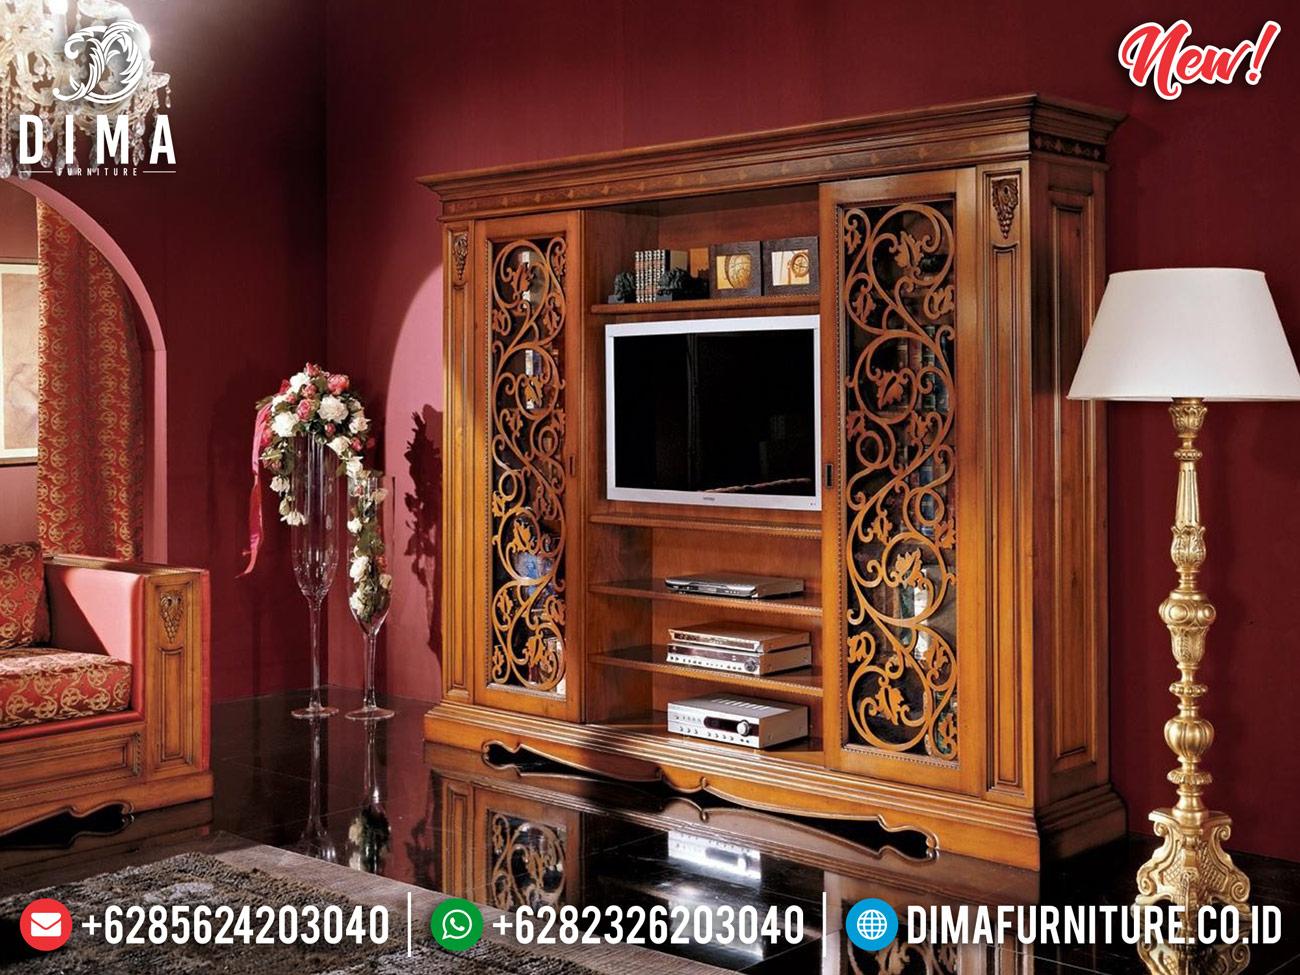 Jual Bufet TV Minimalis Elegant Natural Jati Perhutani Great Wood Quality BT-0769